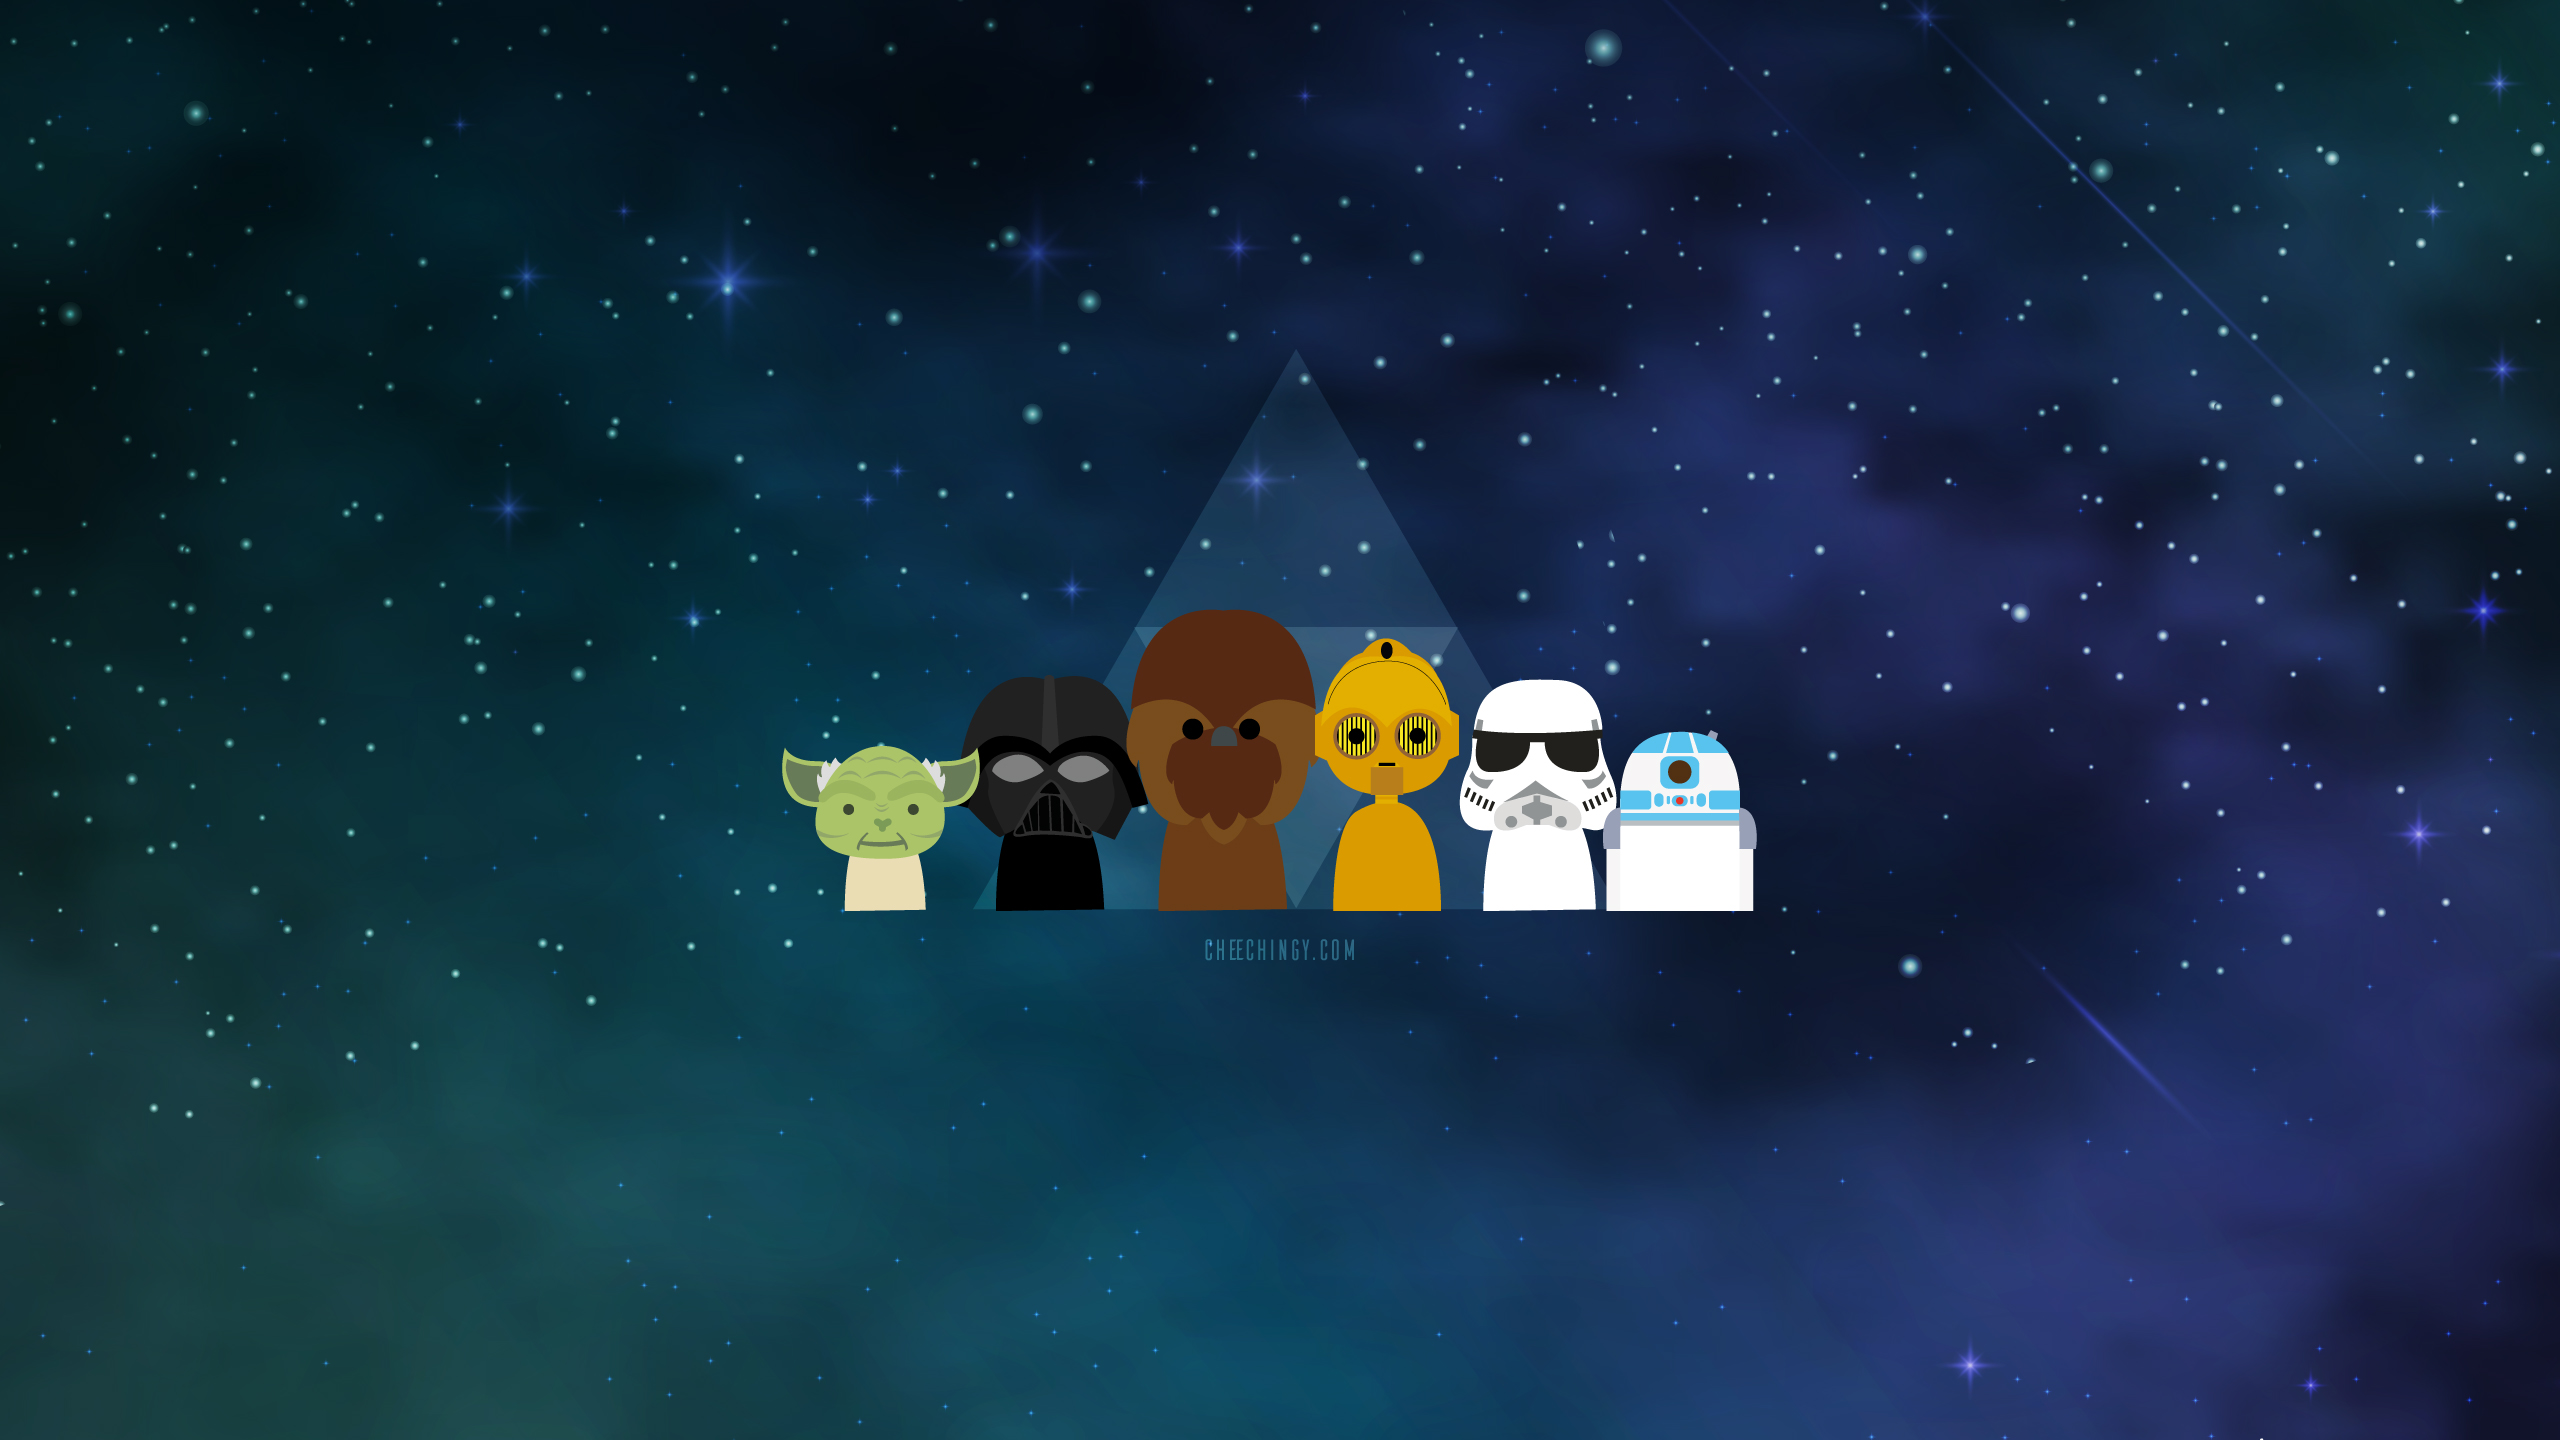 #illustration #wallpaper The Star Wars Chibi Alliance